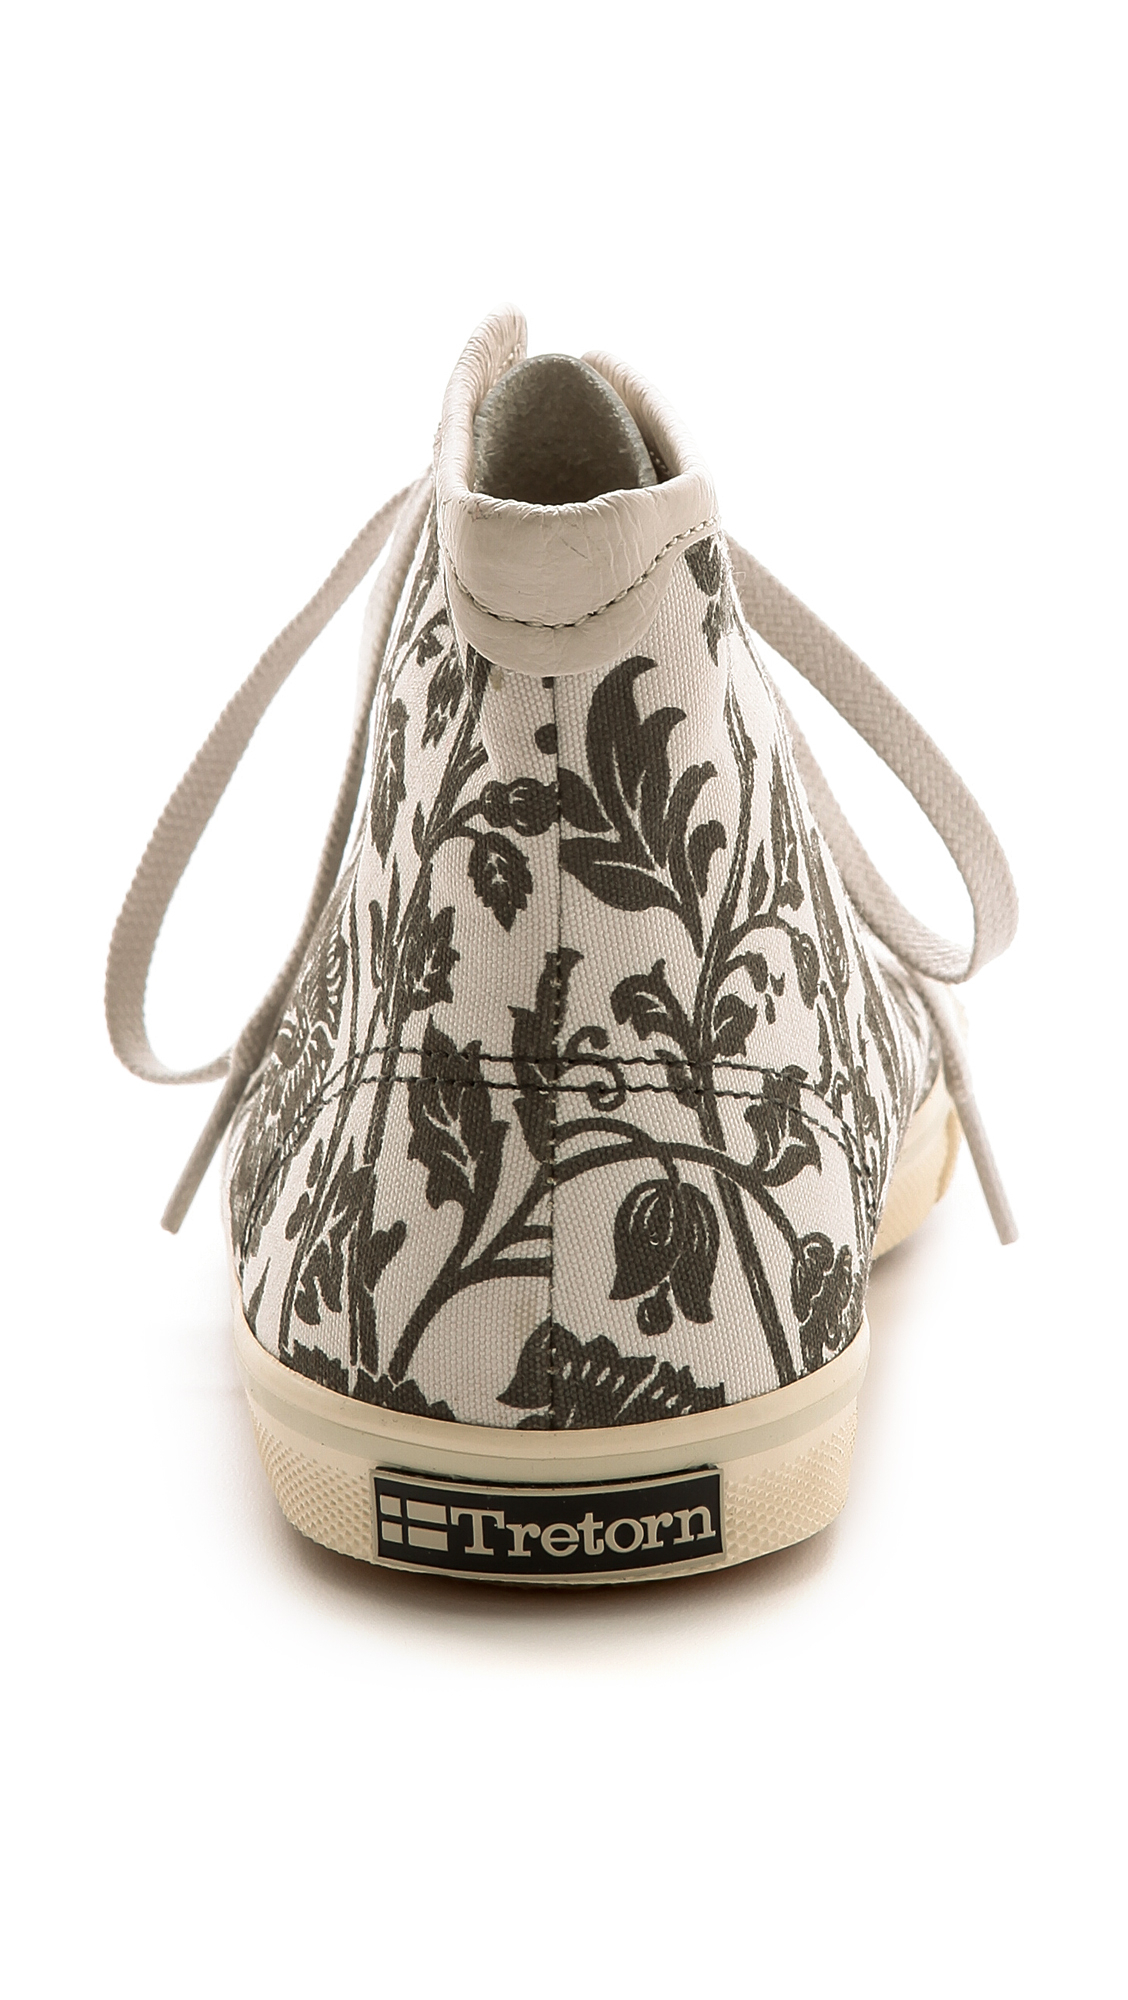 Tretorn Seksti William Morris High Top Sneakers Moonbeam